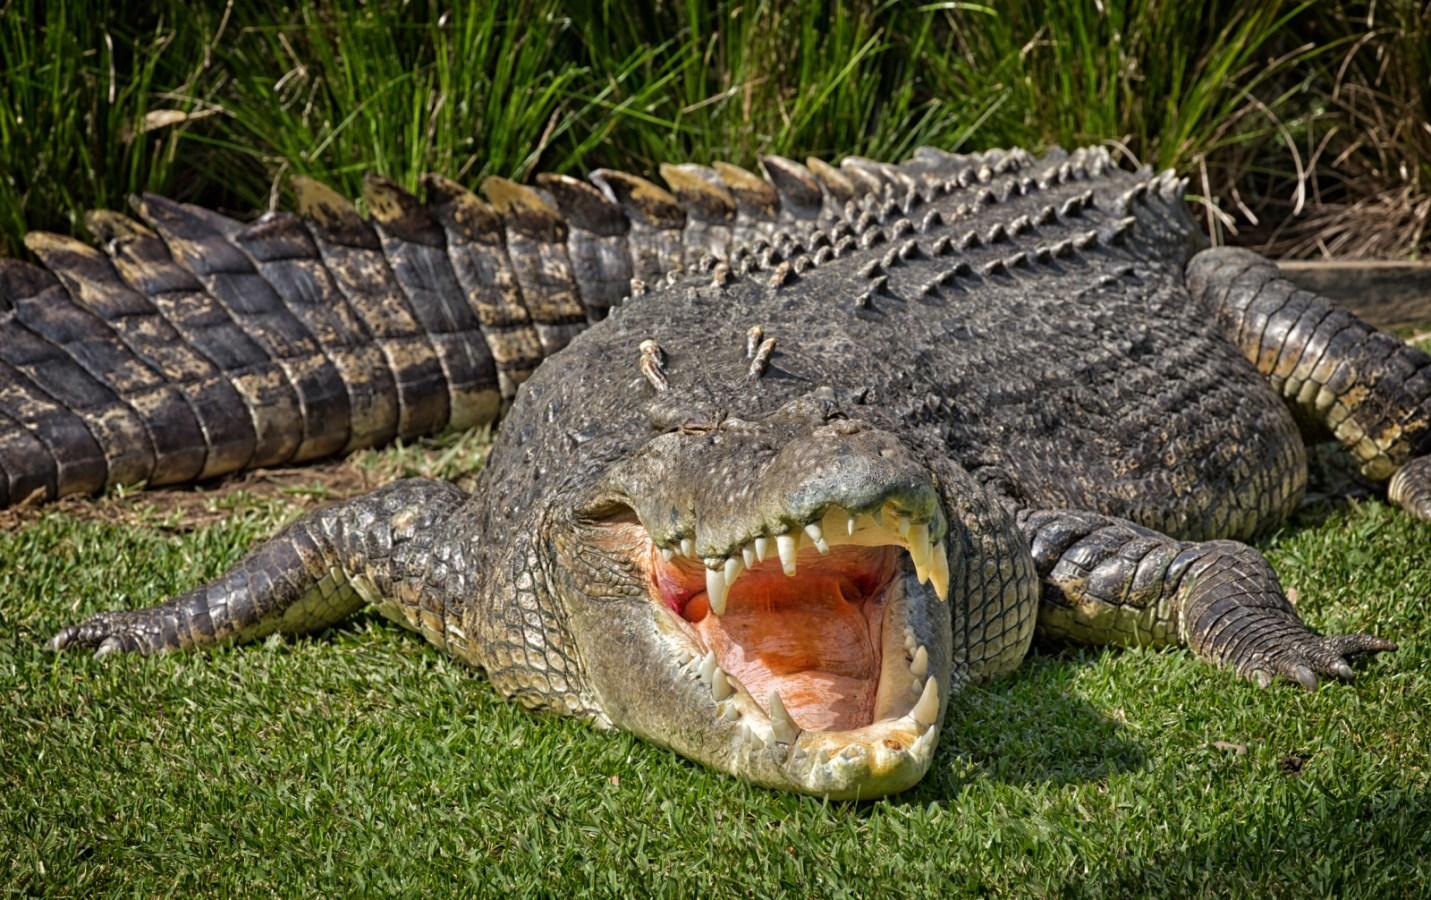 crocodile autopsy reveals surgical